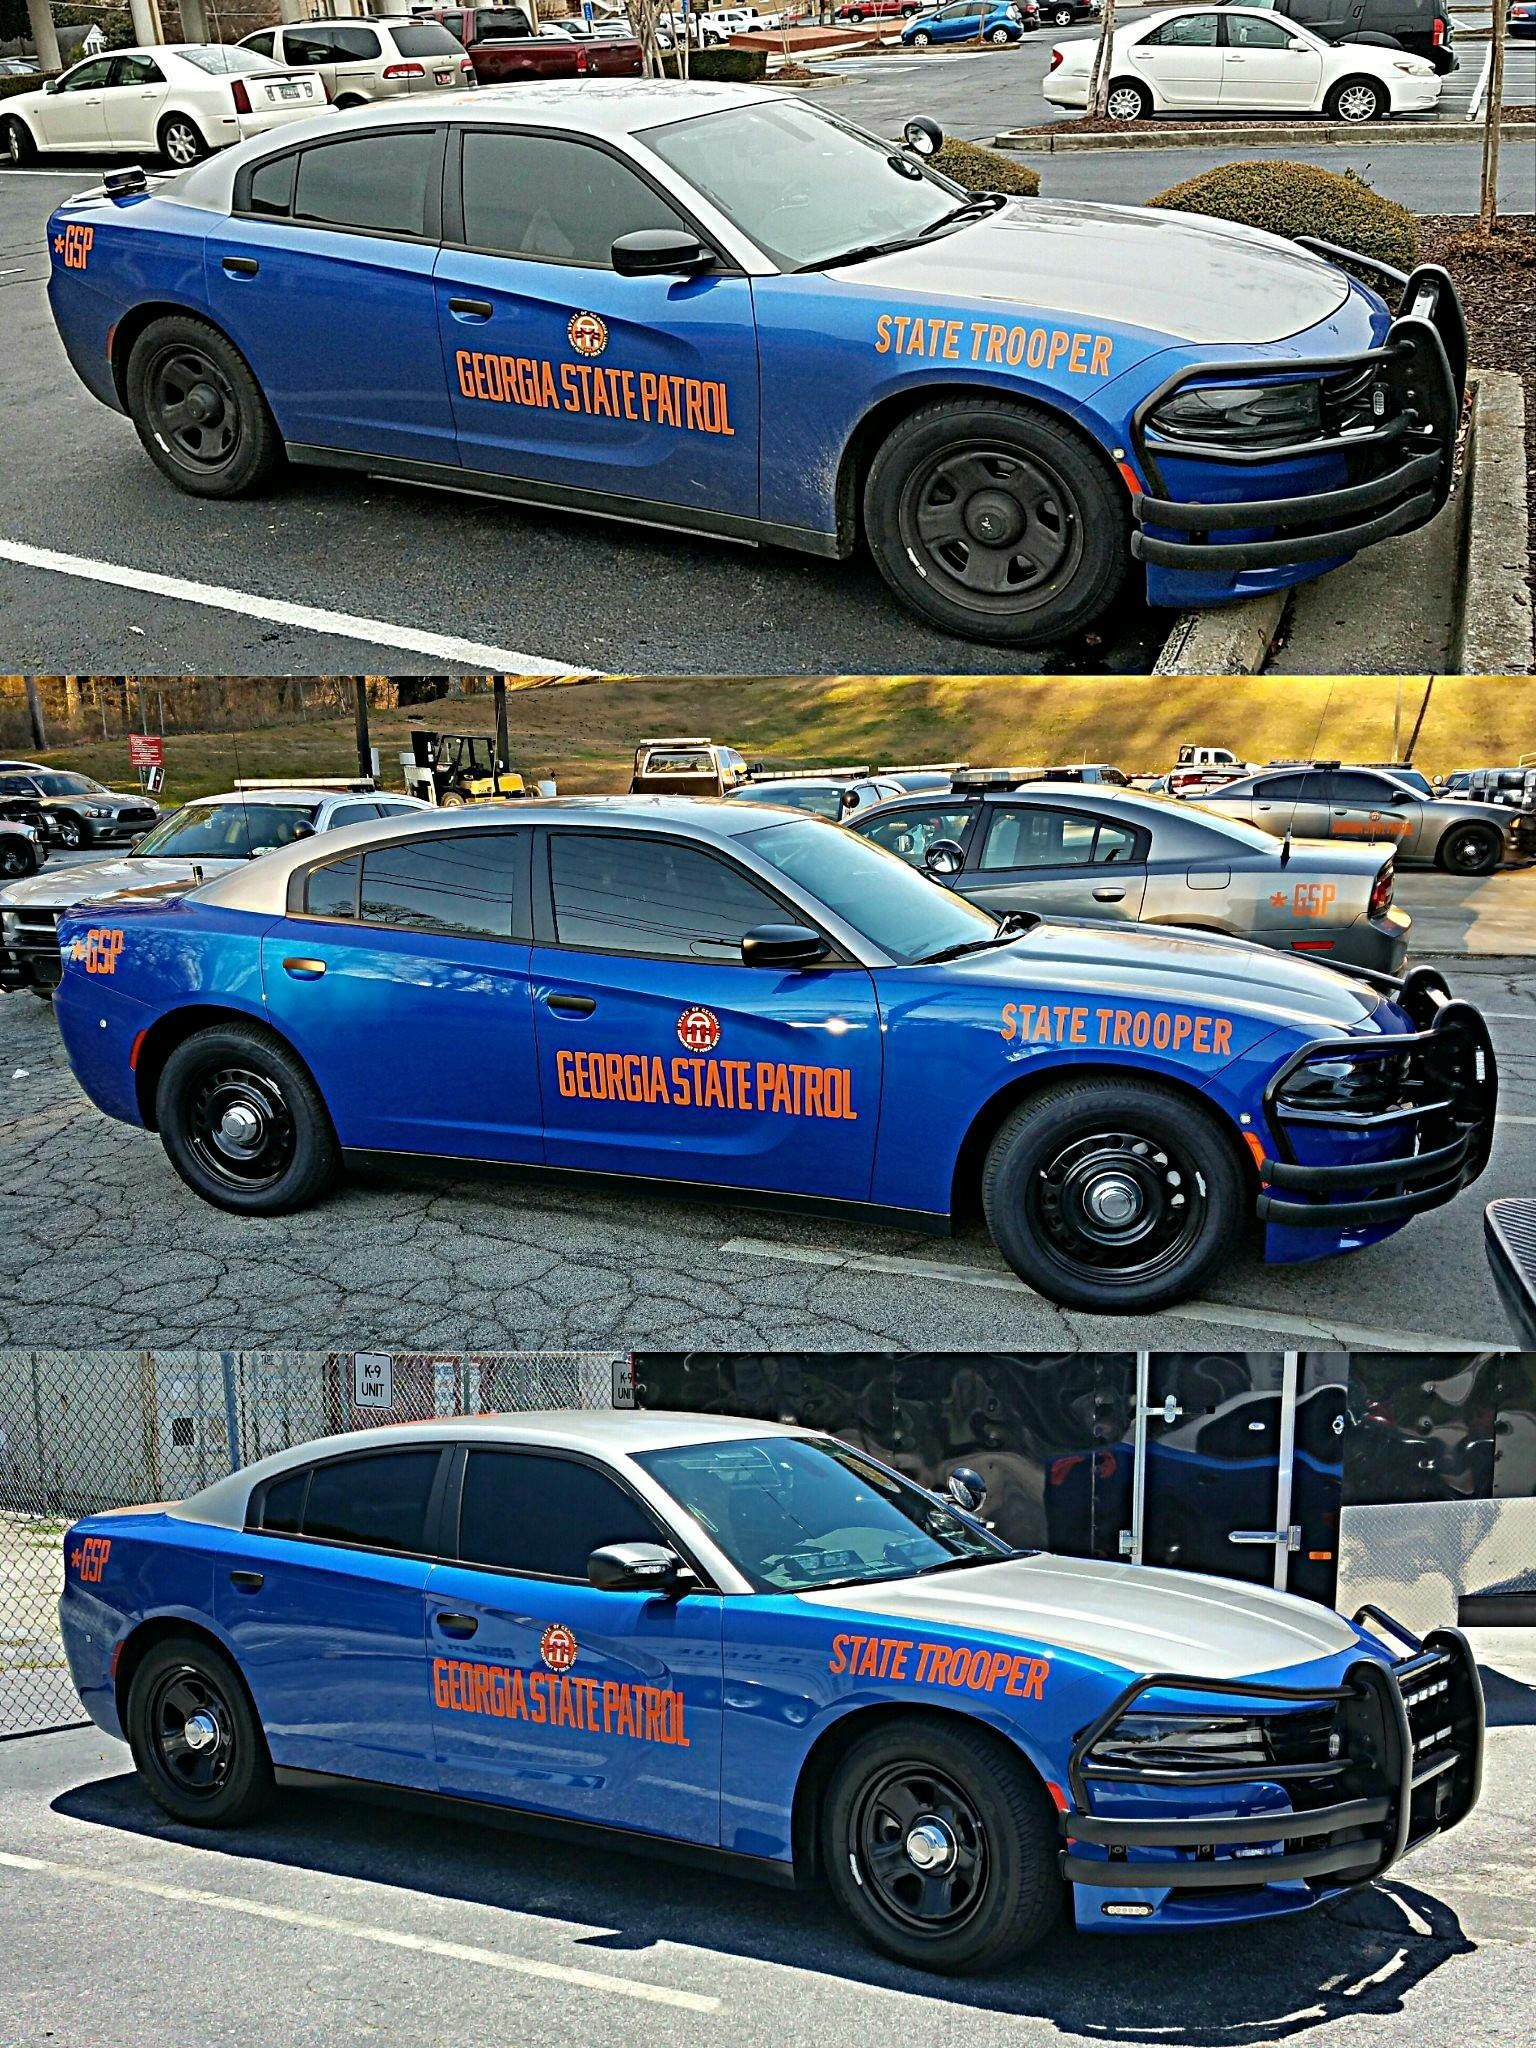 Mississippi HP   State Trooper Plates   Alabama Highway Patrol Decal